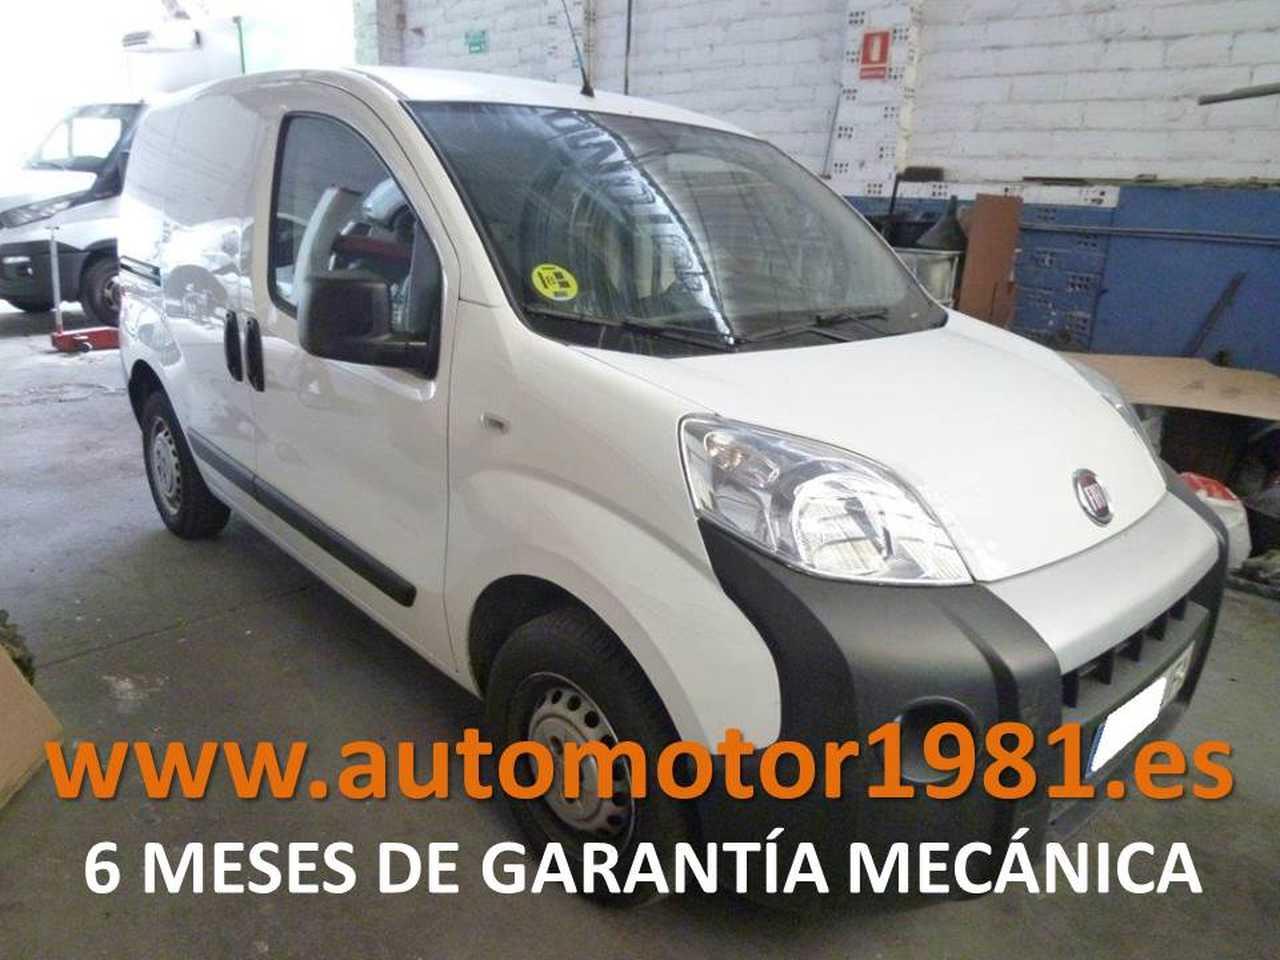 Fiat Fiorino Cargo 1.3Multijet 75cv - 6 MESES GARANTIA MECANICA  - Foto 1